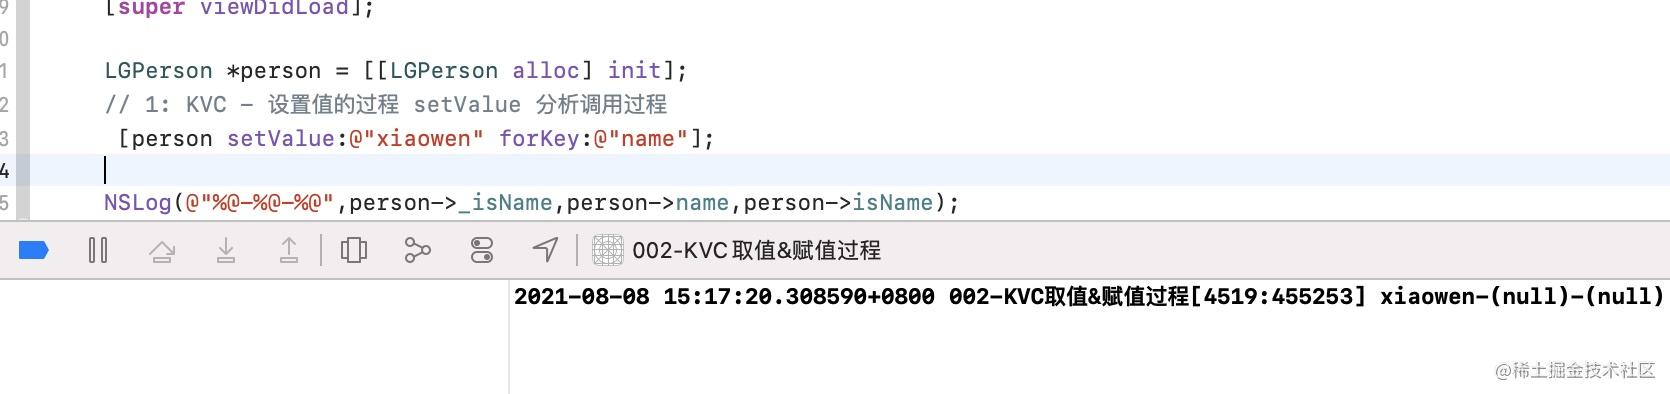 Xnip2021-08-08_15-17-37.jpg